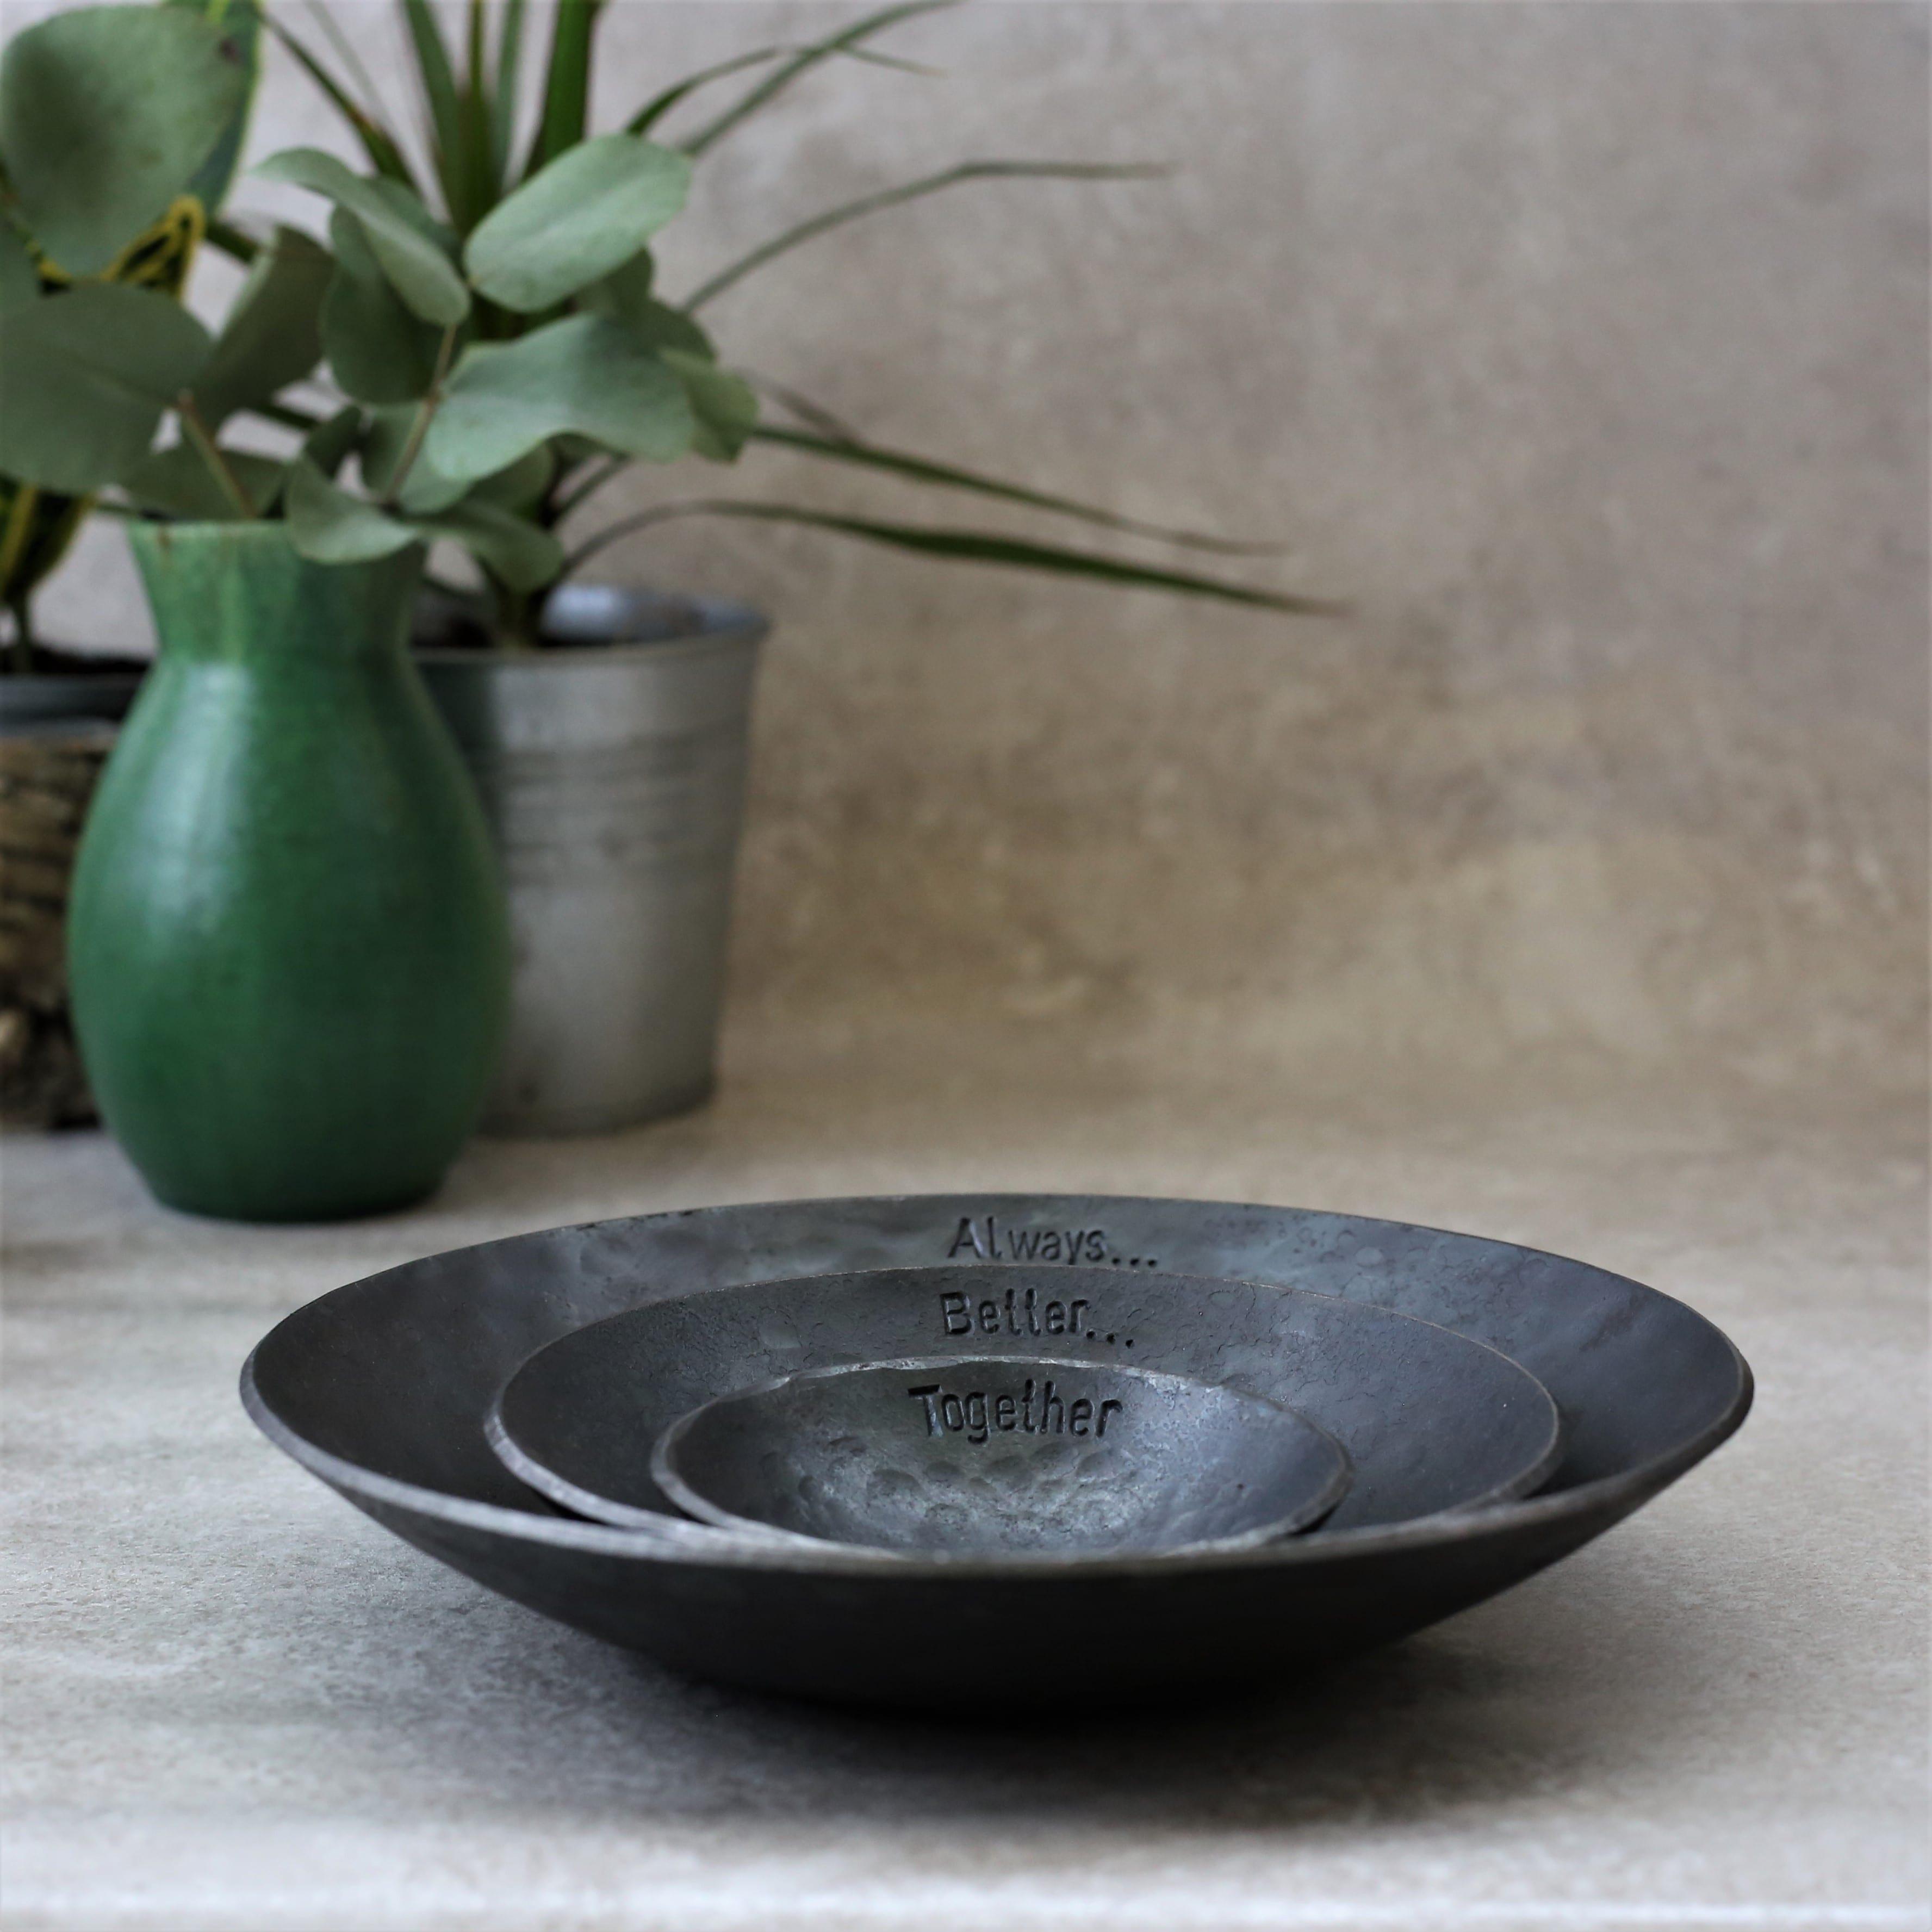 4 Iron Bowls